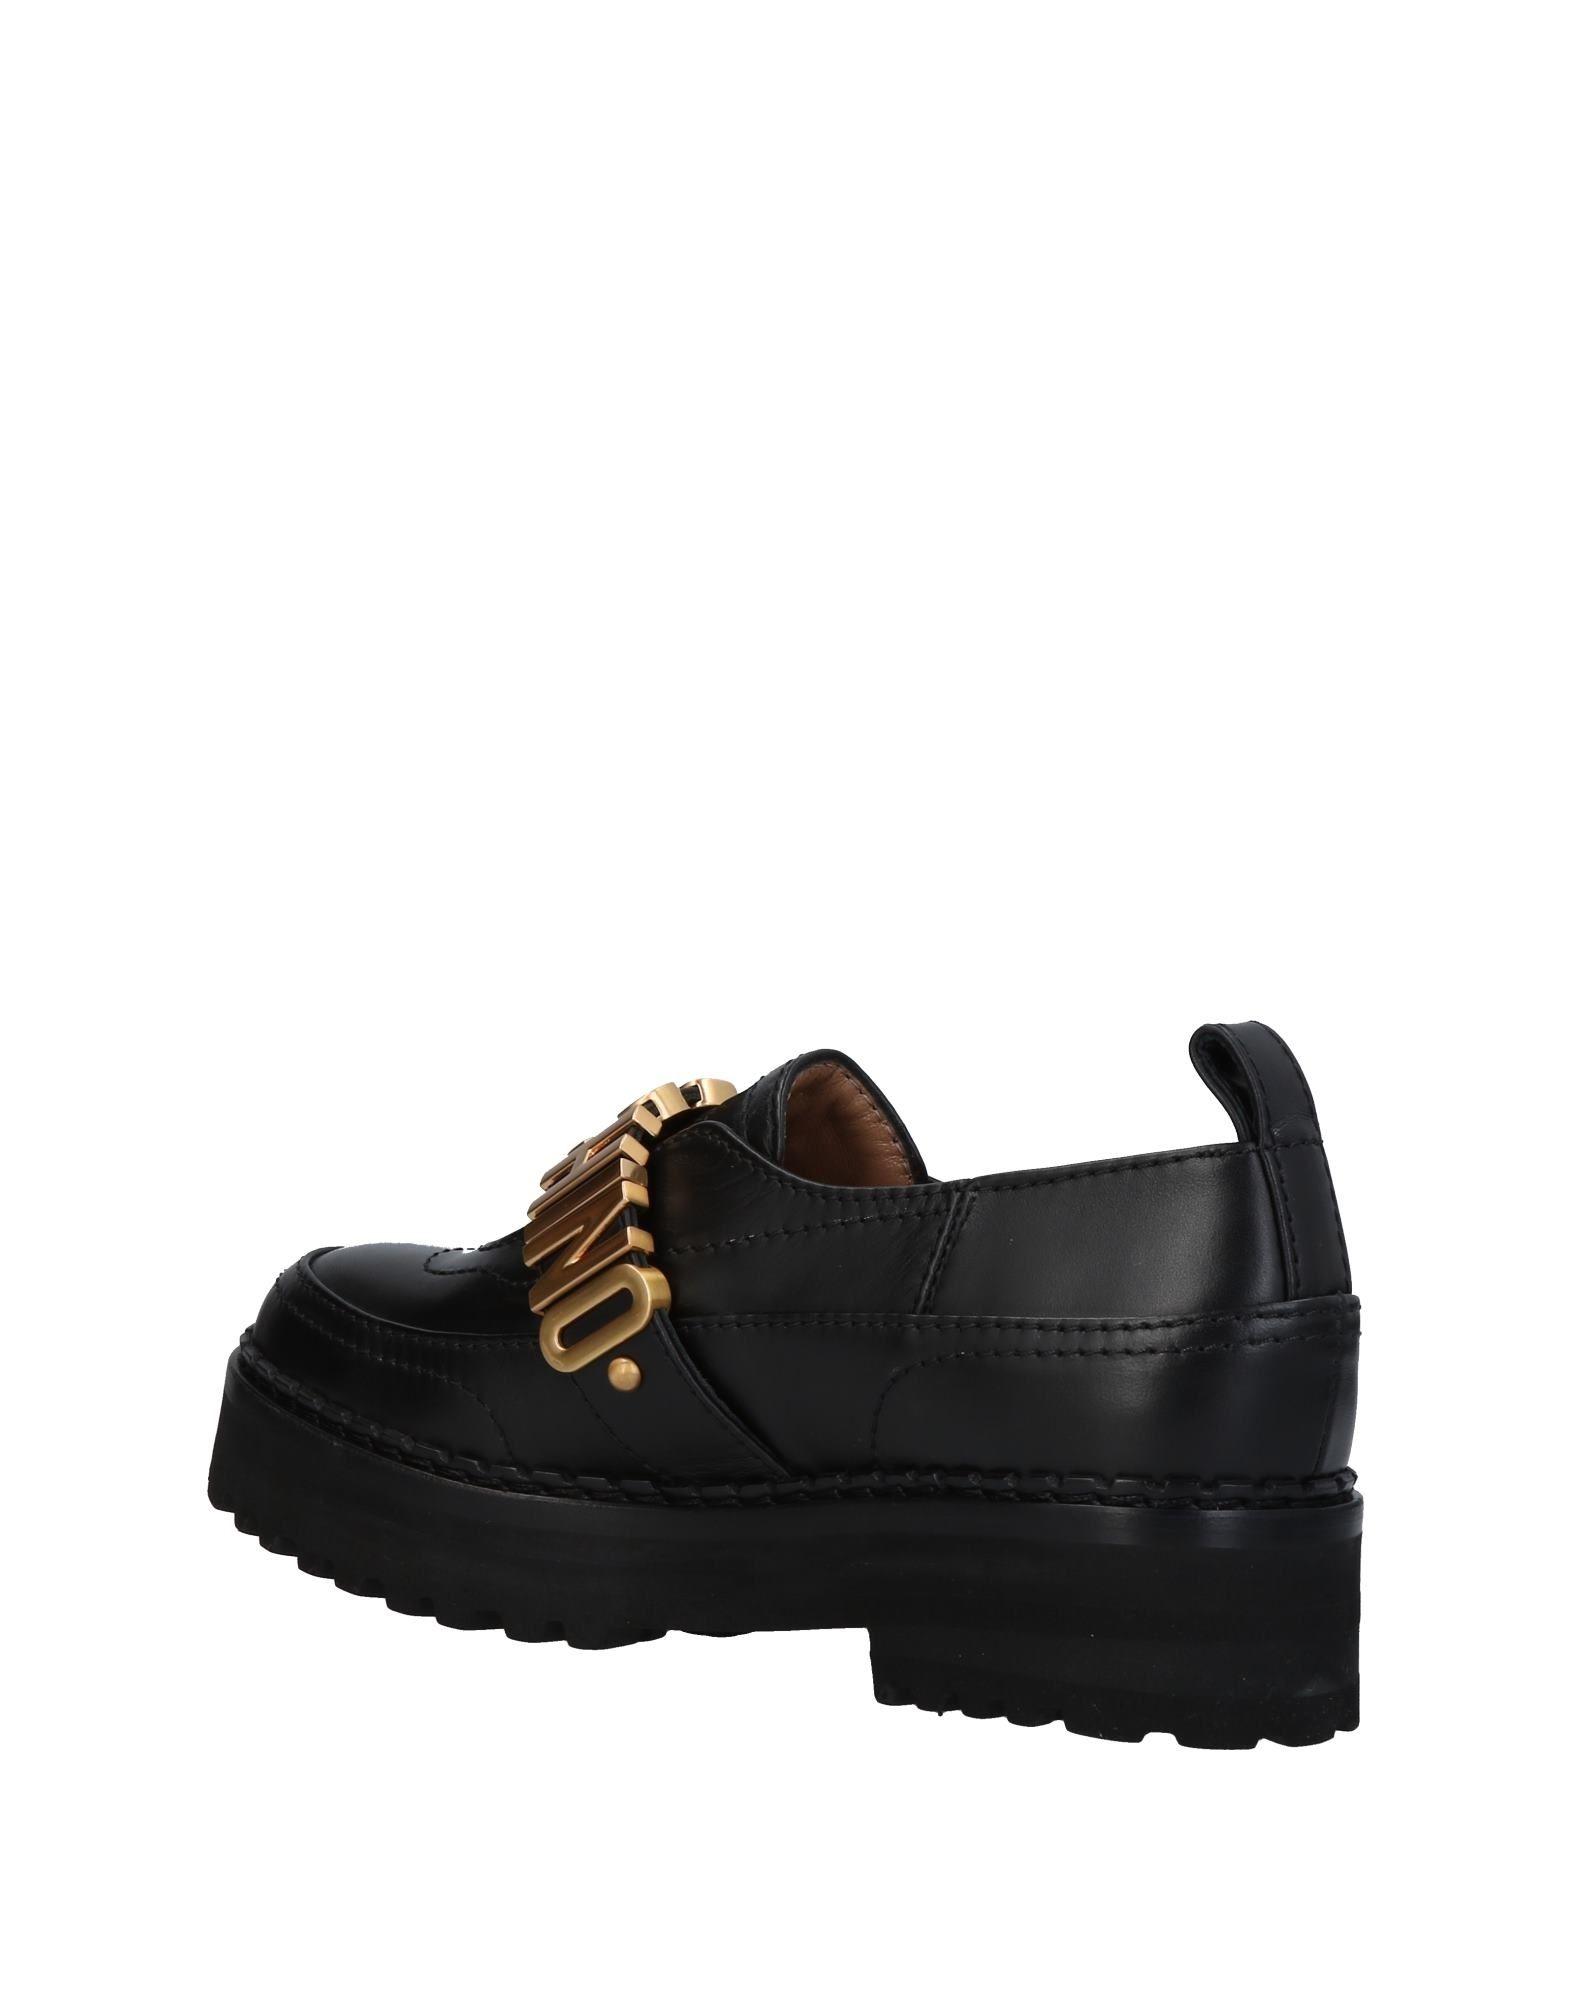 Moschino Mokassins Damen Schuhe  11451064WB Heiße Schuhe Damen 567935